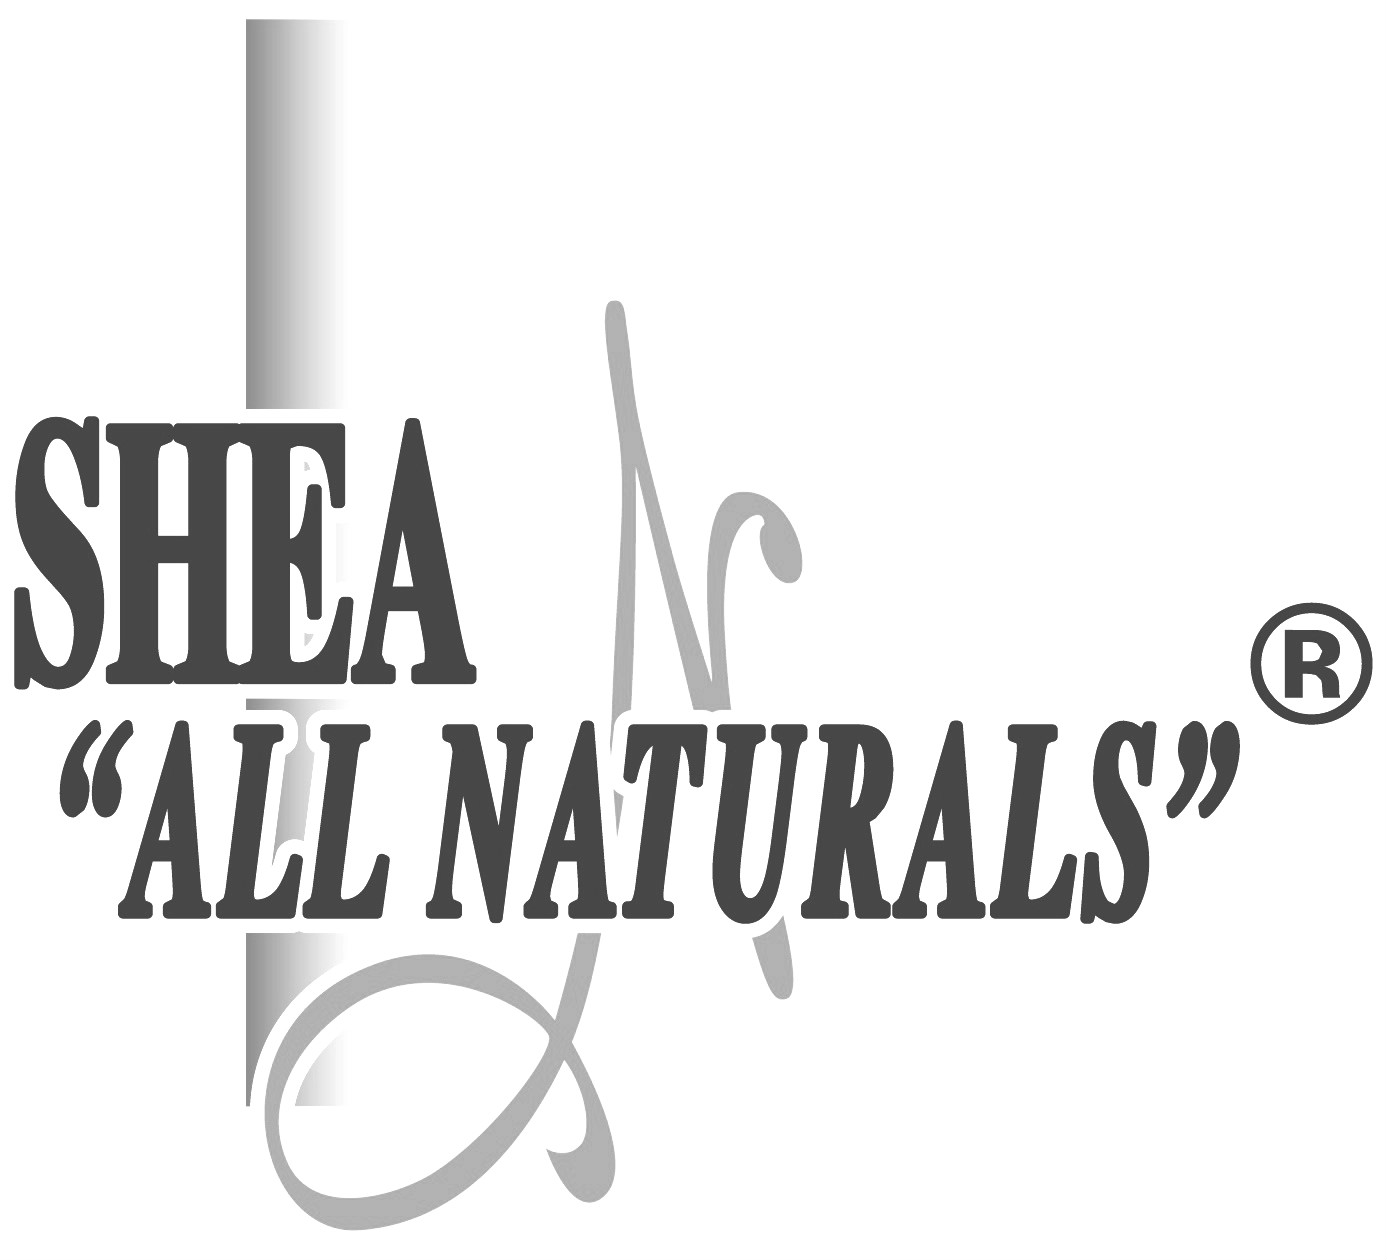 All naturall_logo bw2.jpg